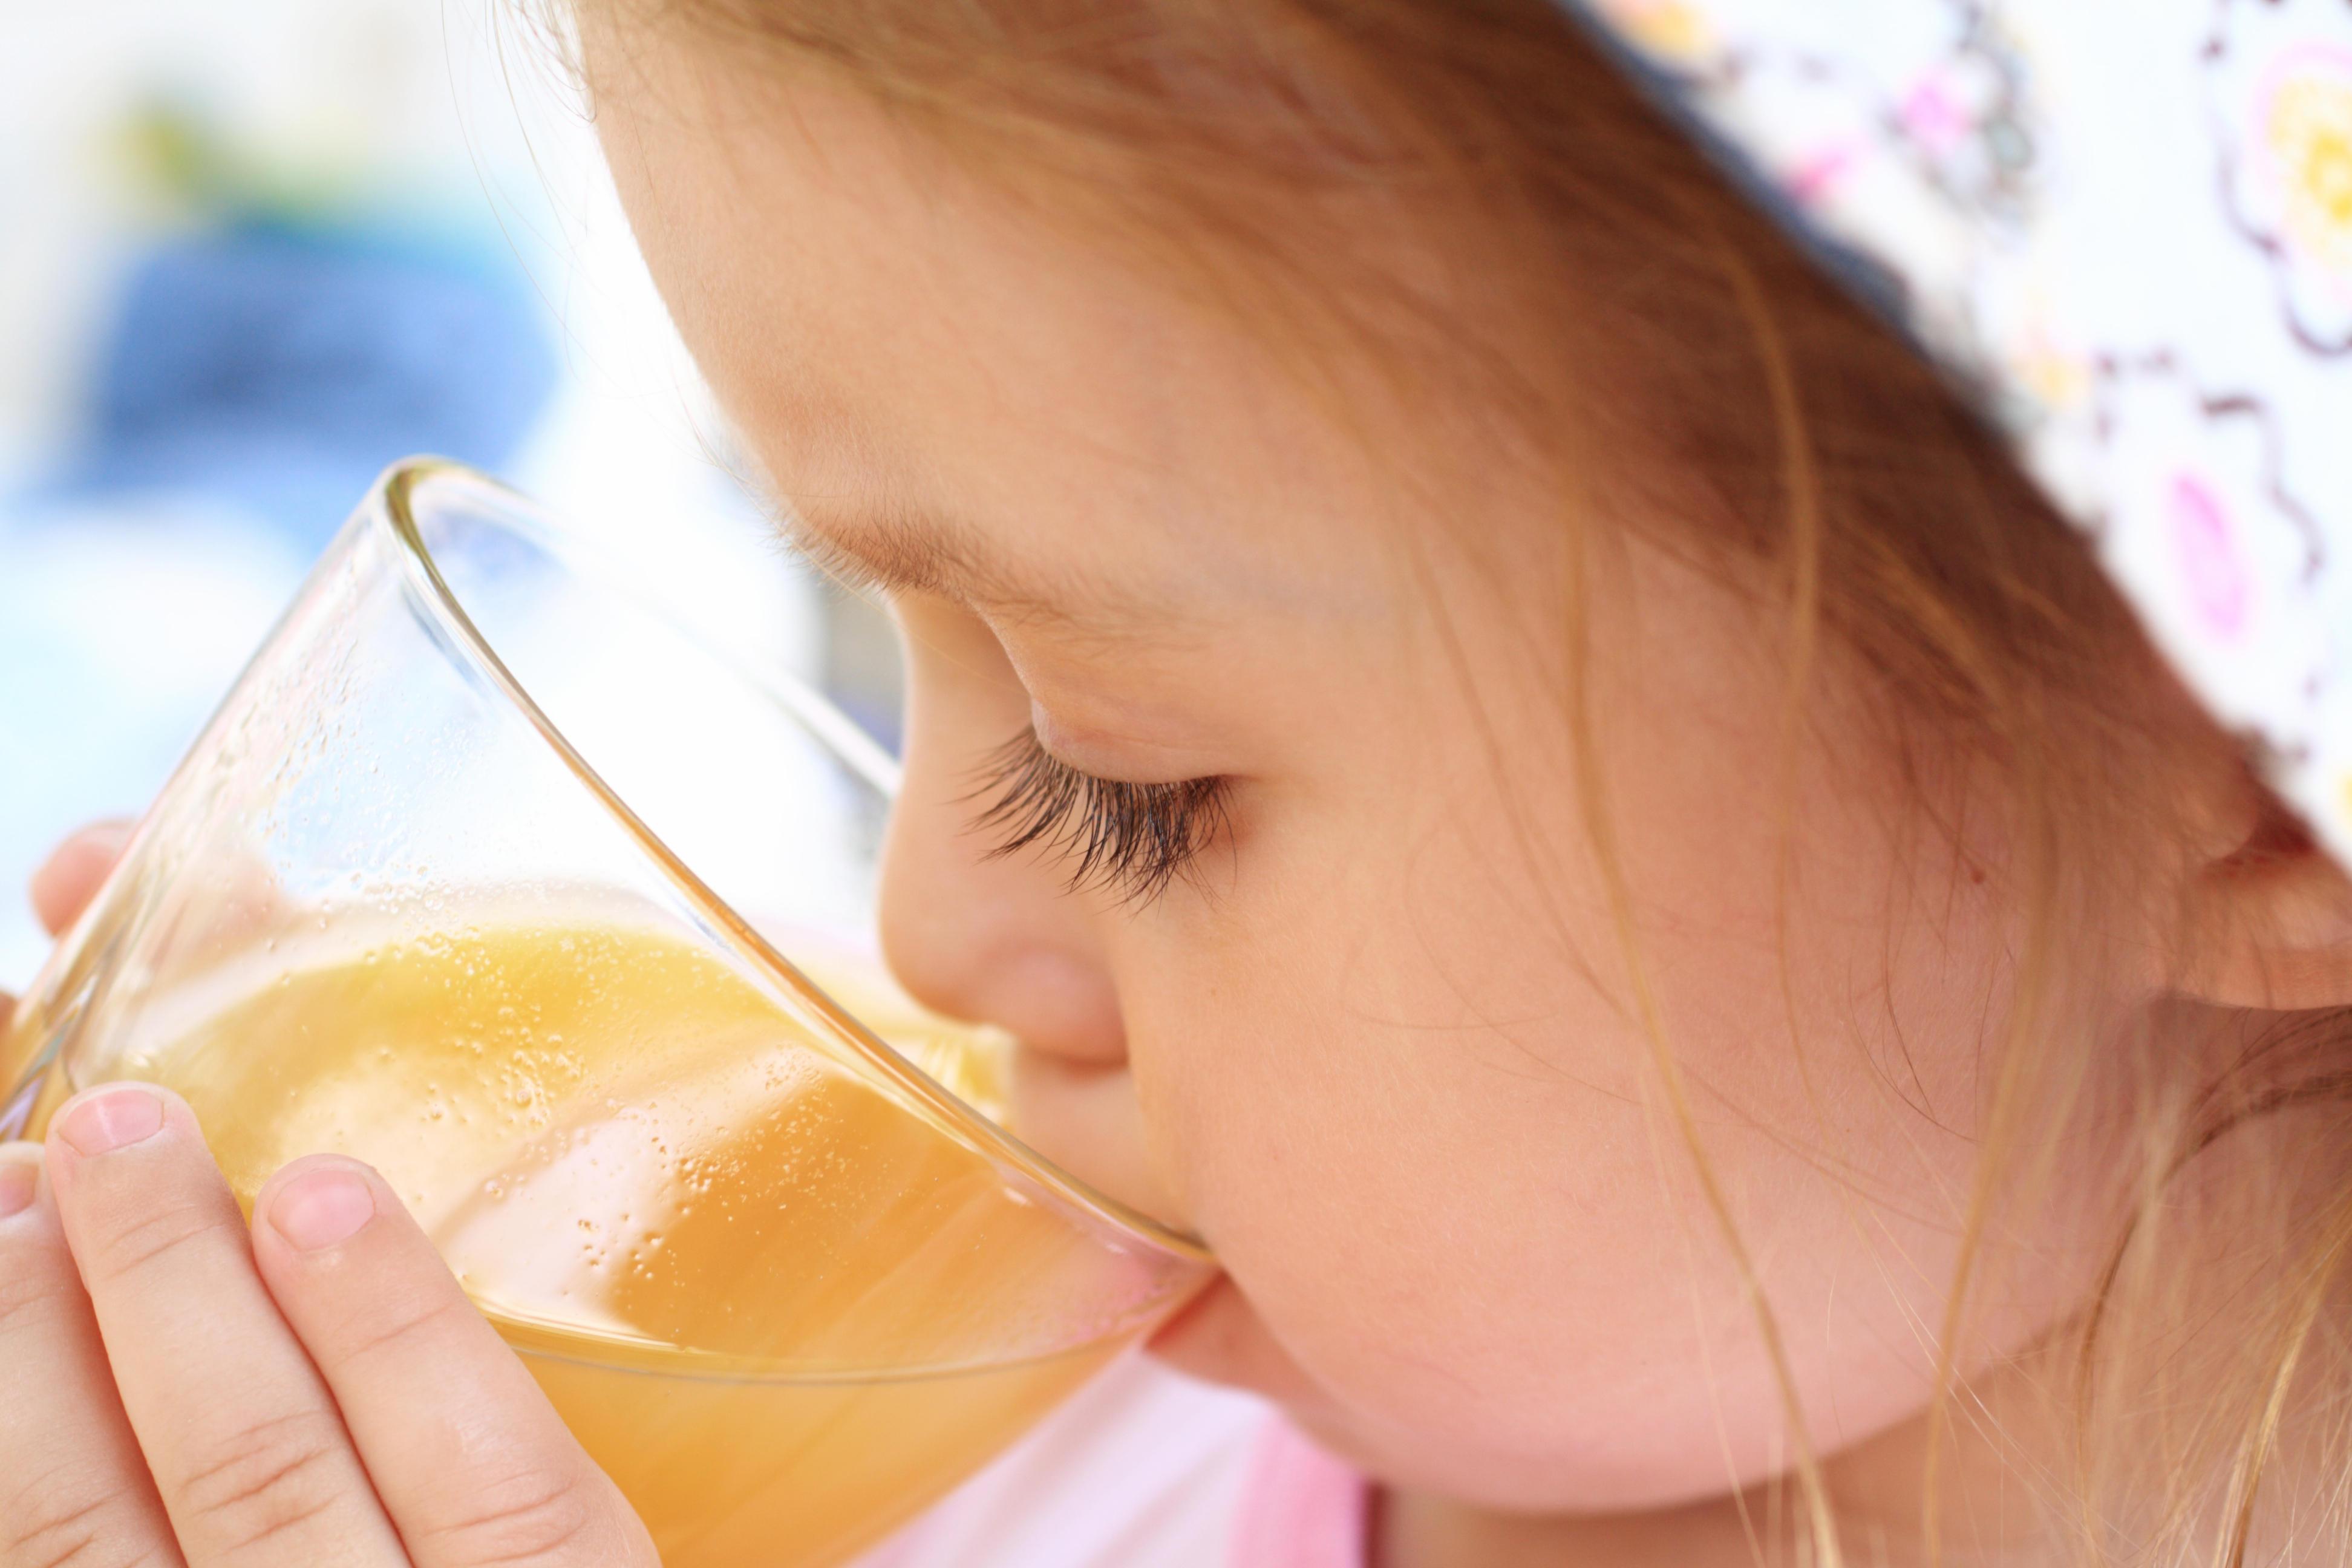 american academy of pediatrics obesity guidelines